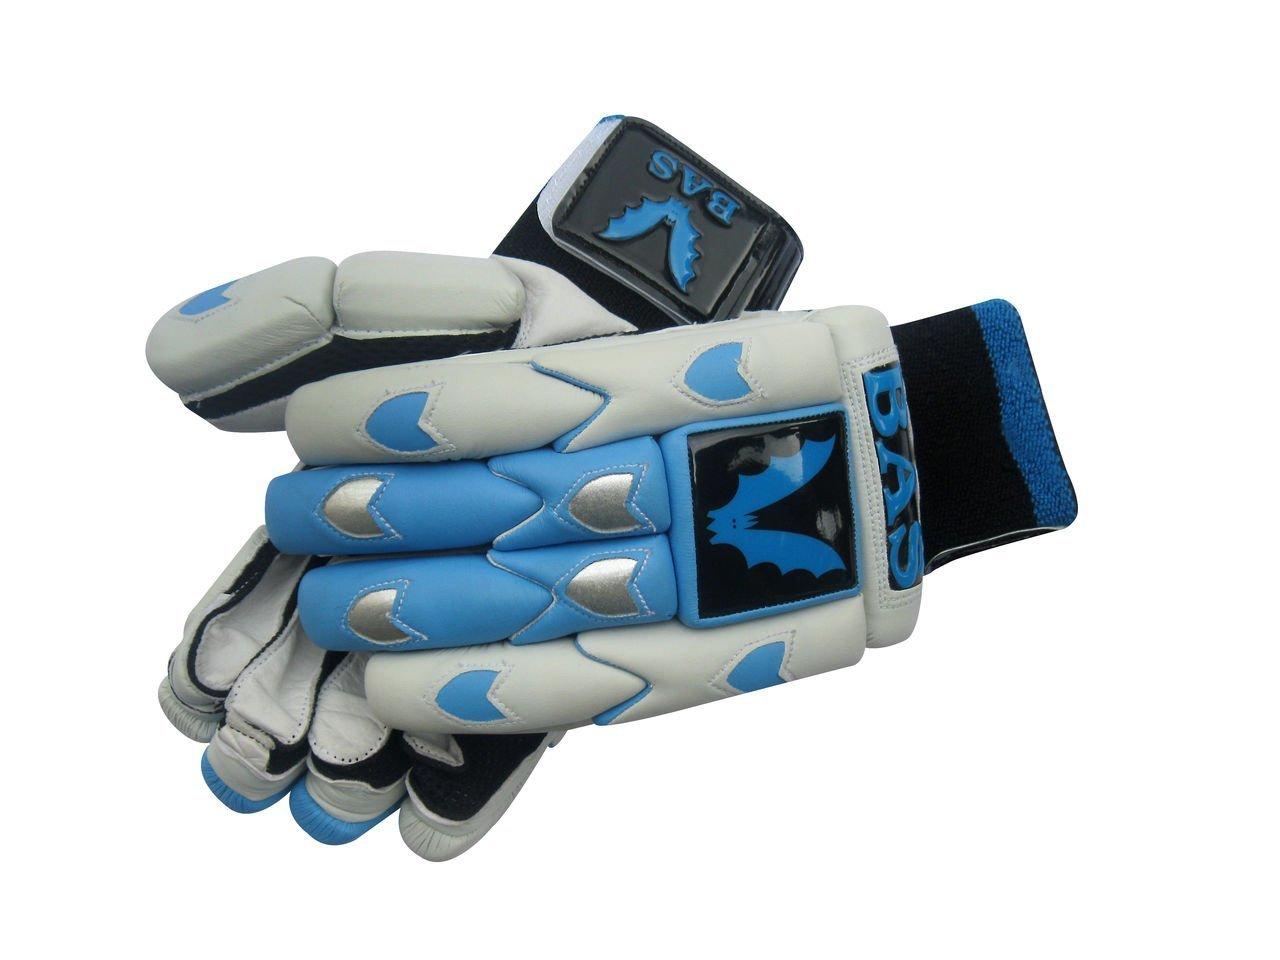 Centurionバッティング手袋、Fullサイズ B00NTI7JHM